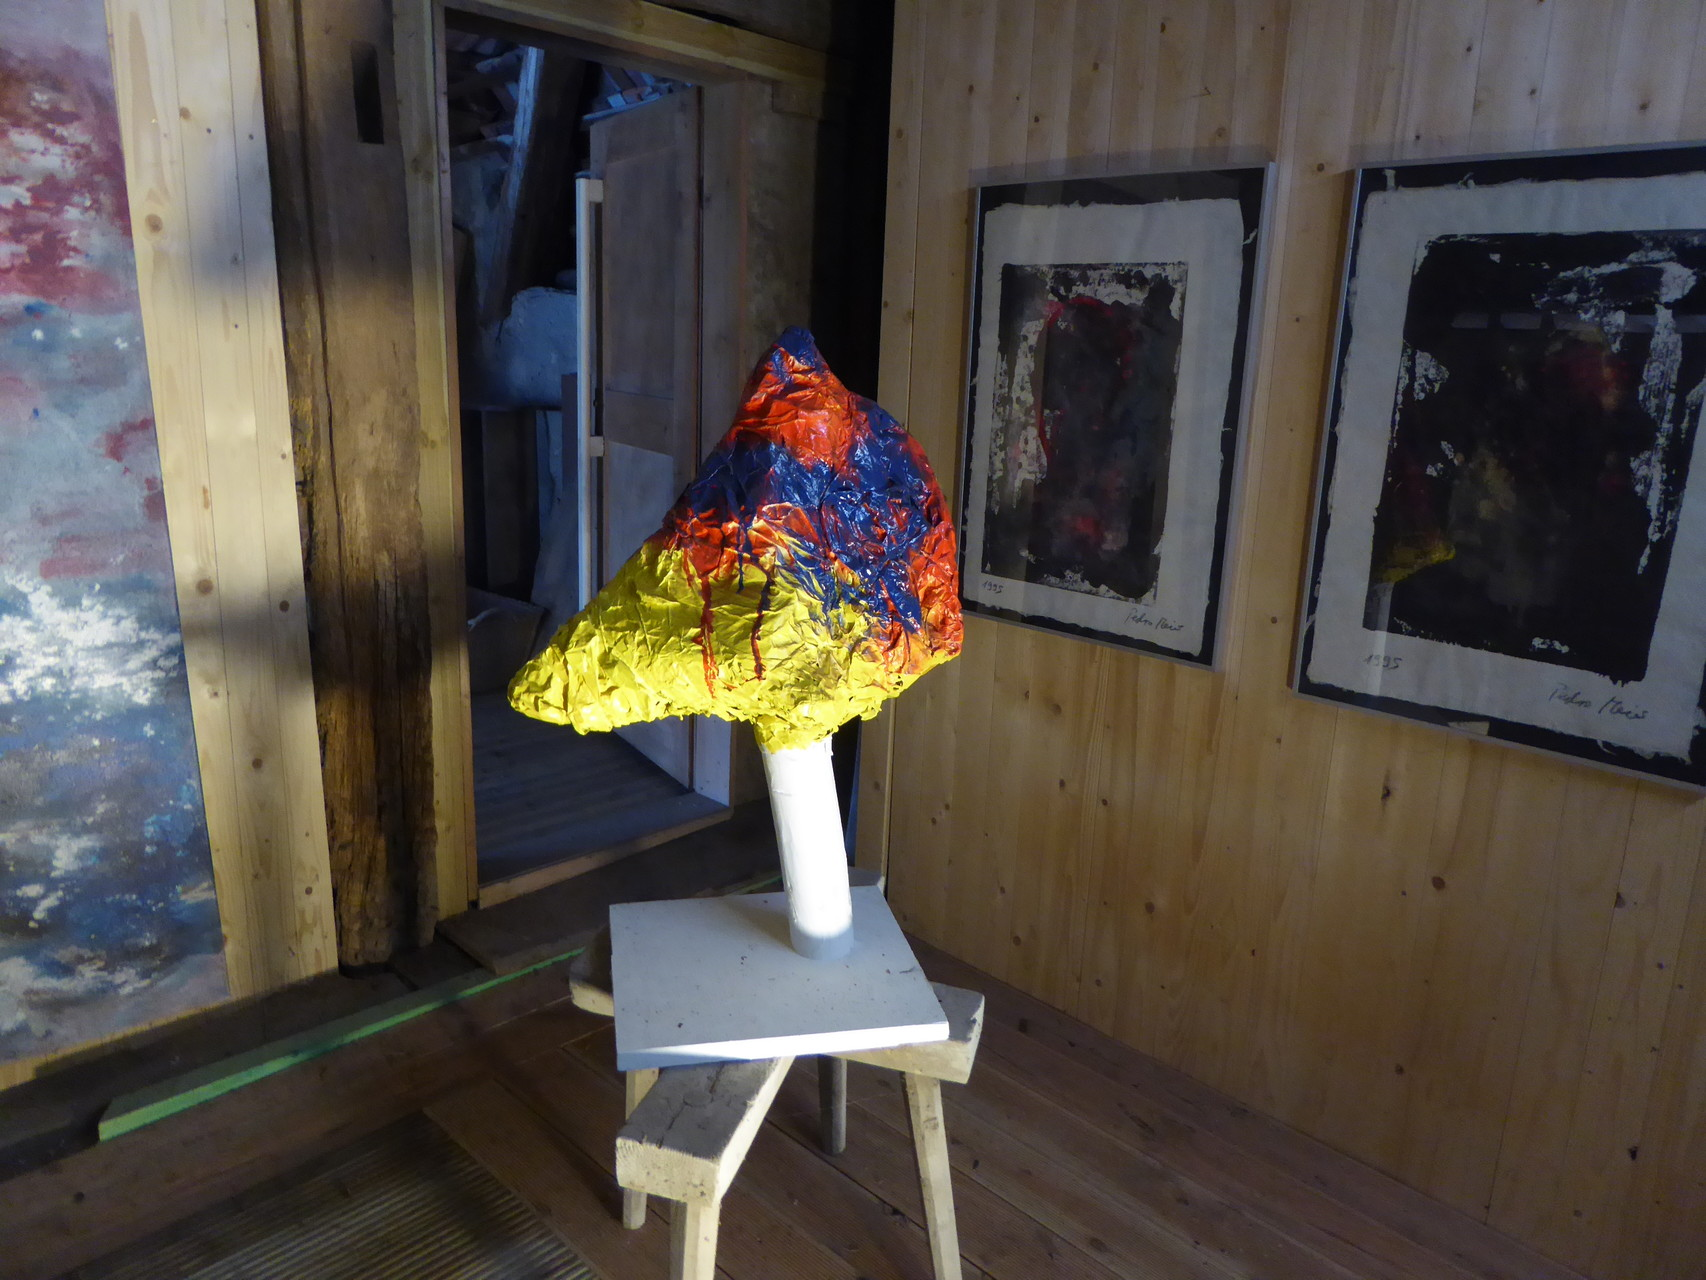 Pedro Meier – Skulptur – Kopf – (Maschendraht – Papier und Vlies mit Lackfarben mehrfarbig übermalt) 2015 – Atelier-Scheune – Photo © Pedro Meier Multimedia Artist / ProLitteris – Gerhard Meier Weg Niederbipp – (Atelier: Niederbipp – Olten – Bangkok)